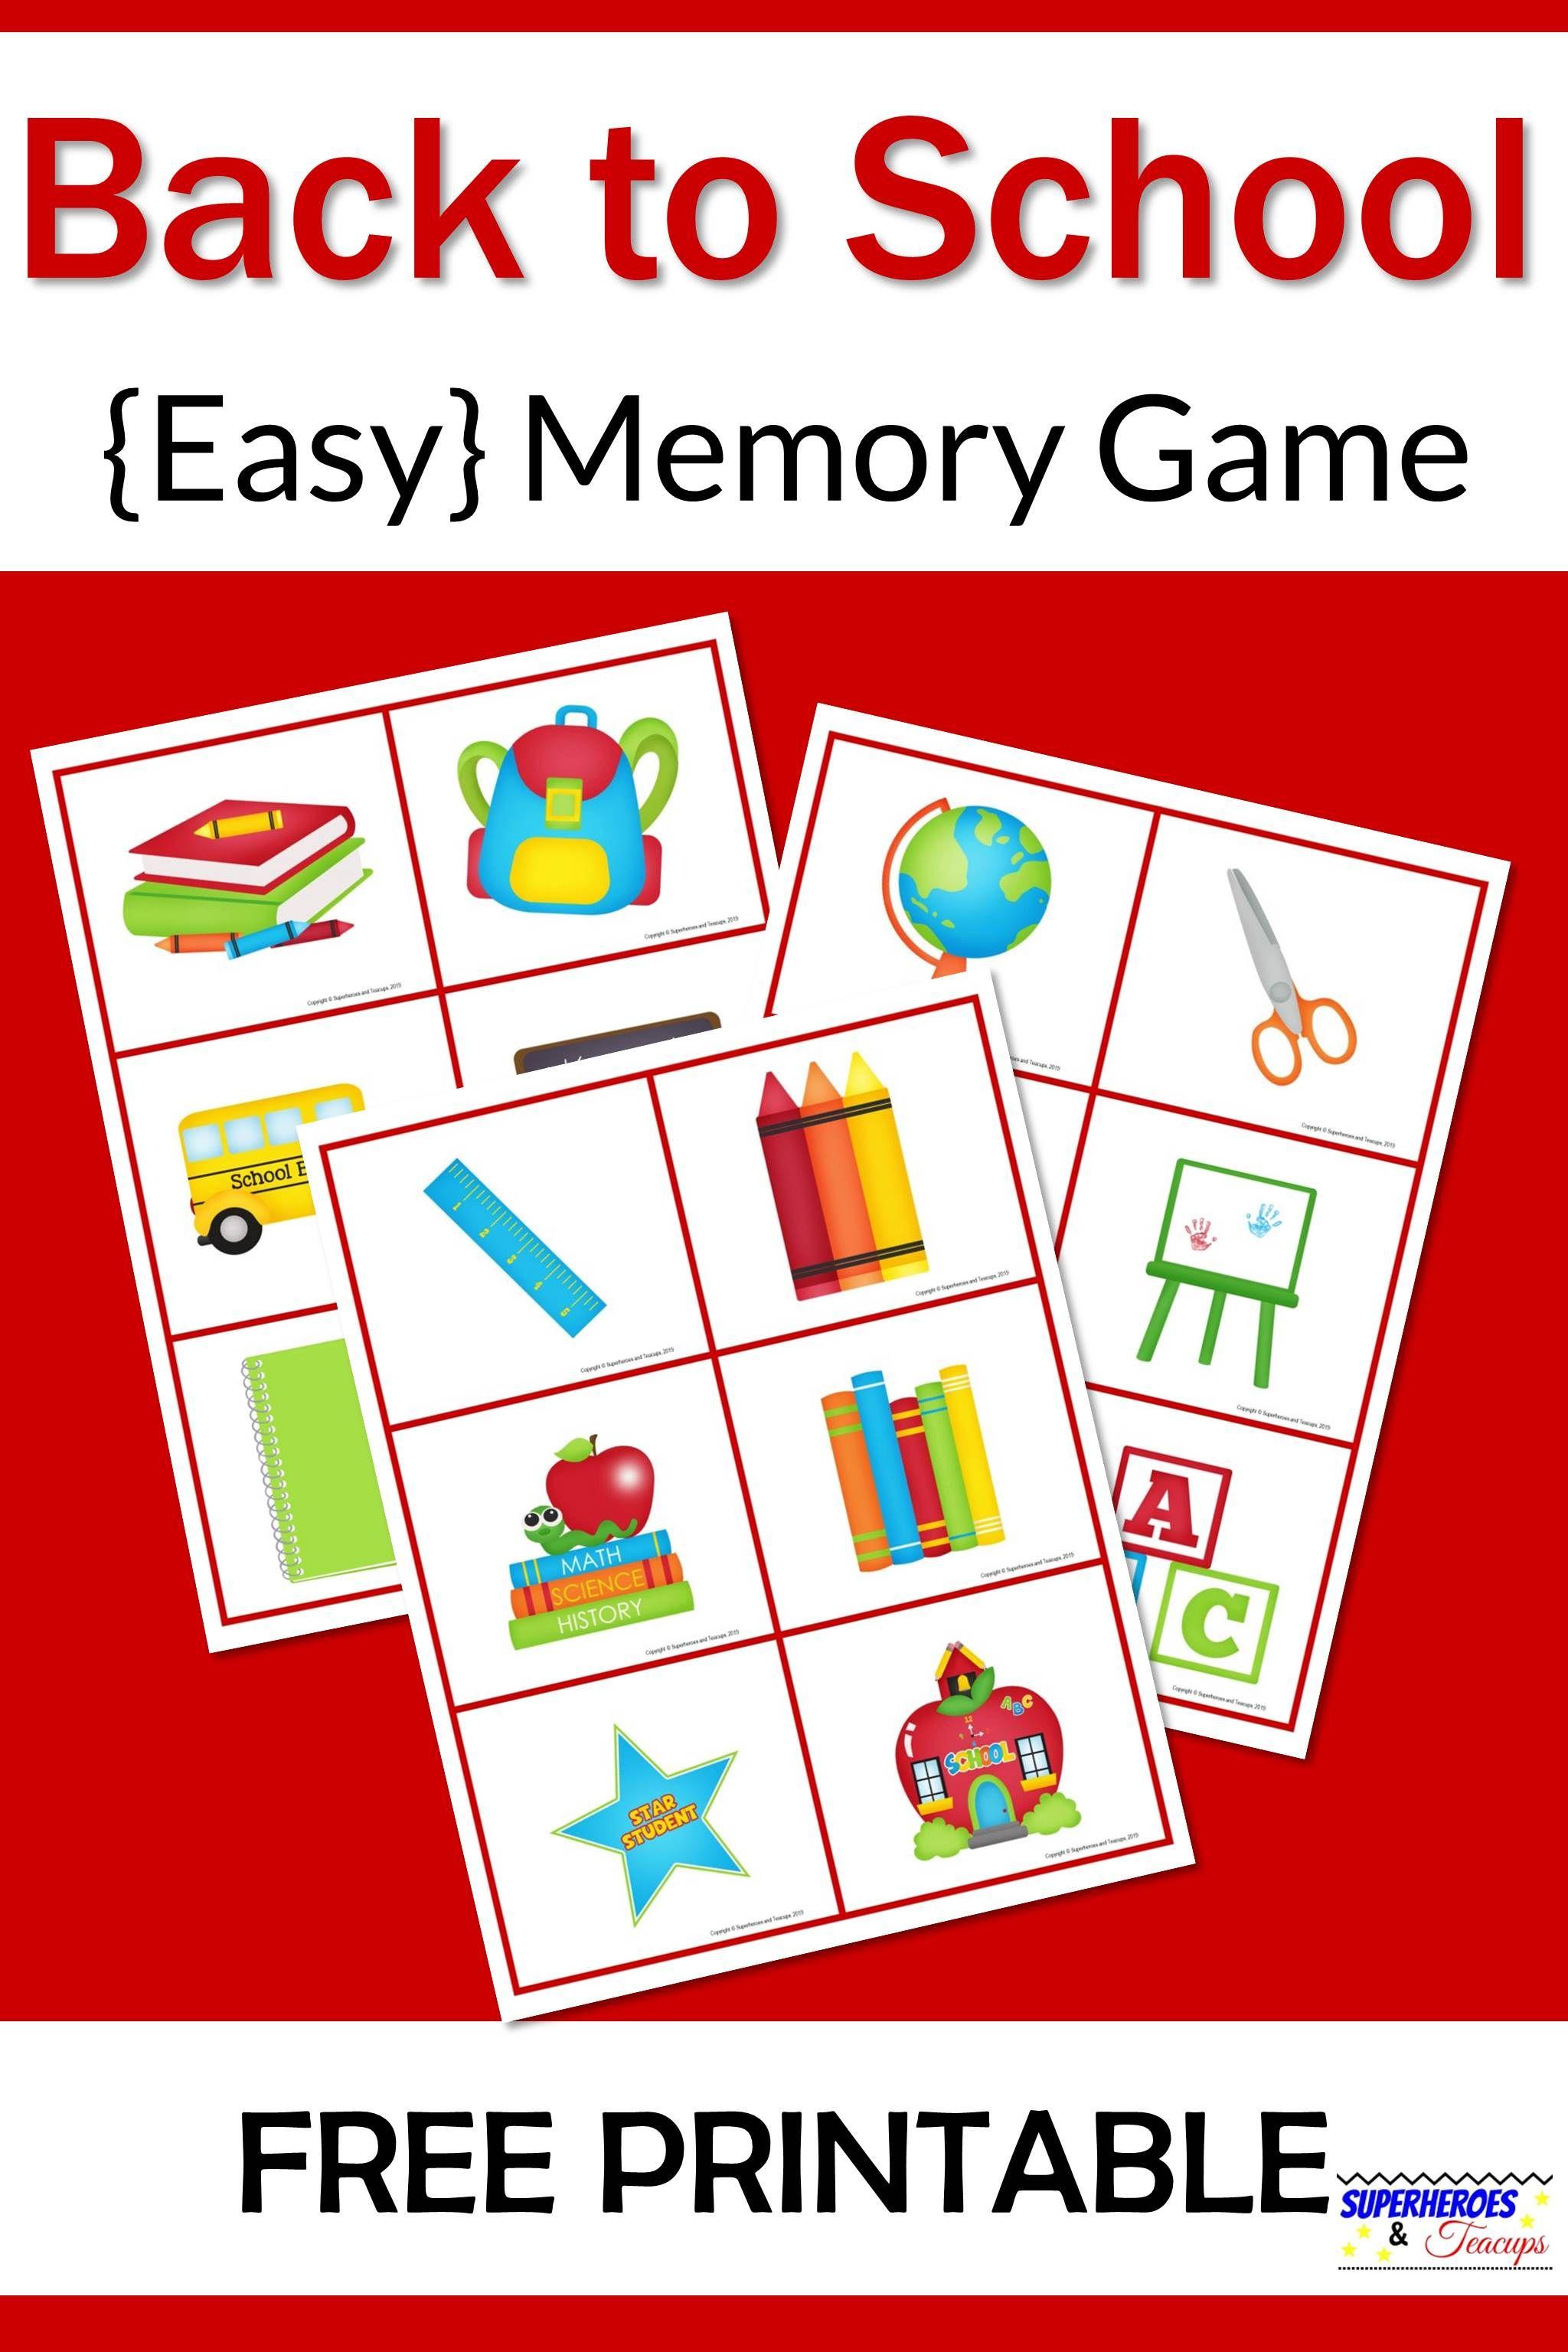 Back To School Memory Game Free Printable